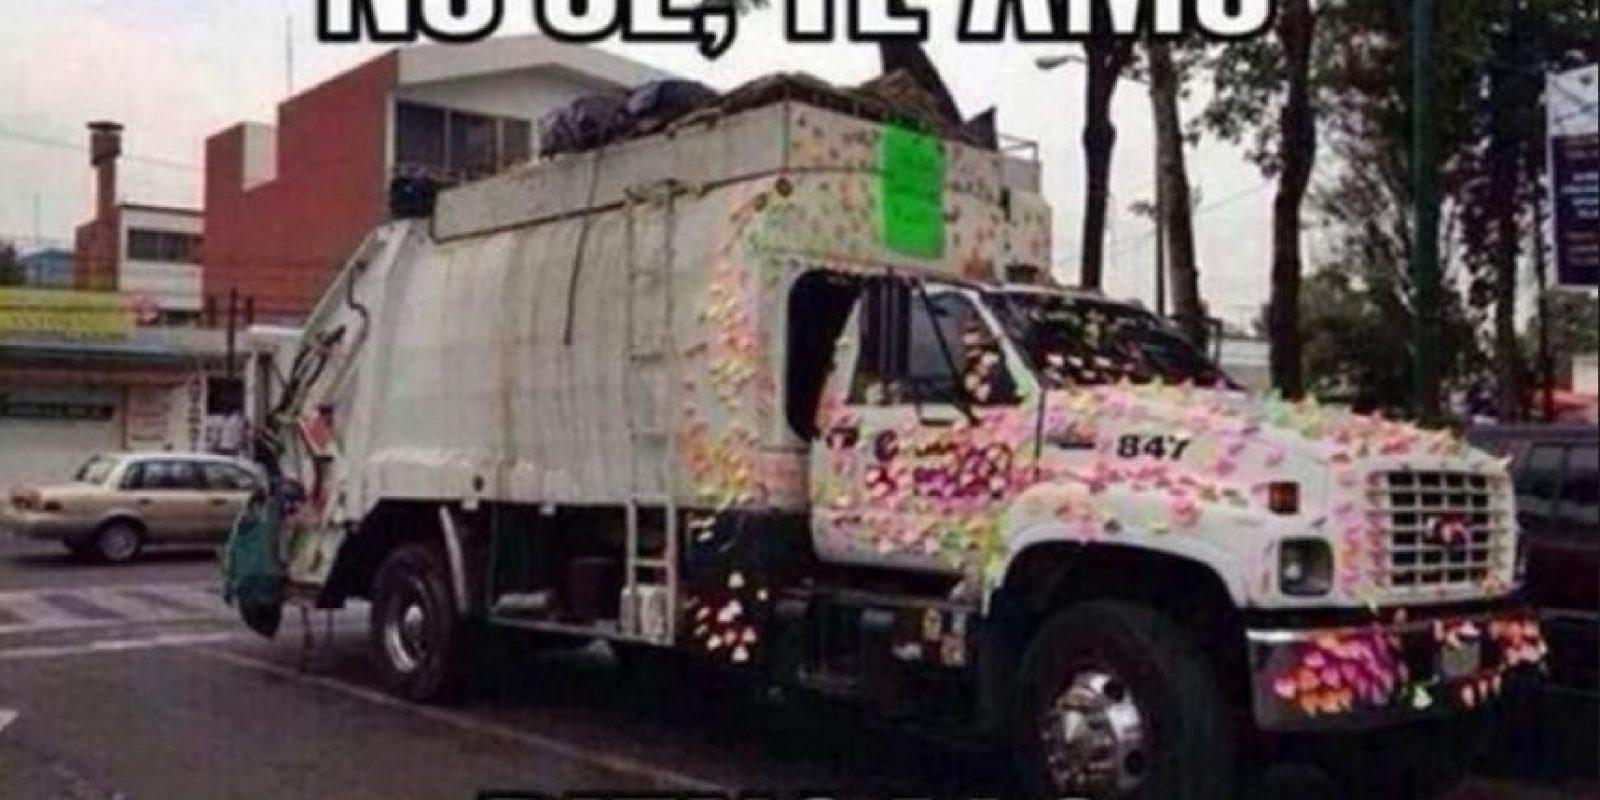 Post its en el camión de basura Foto:Tumblr.com/tagged/pareja/wtf